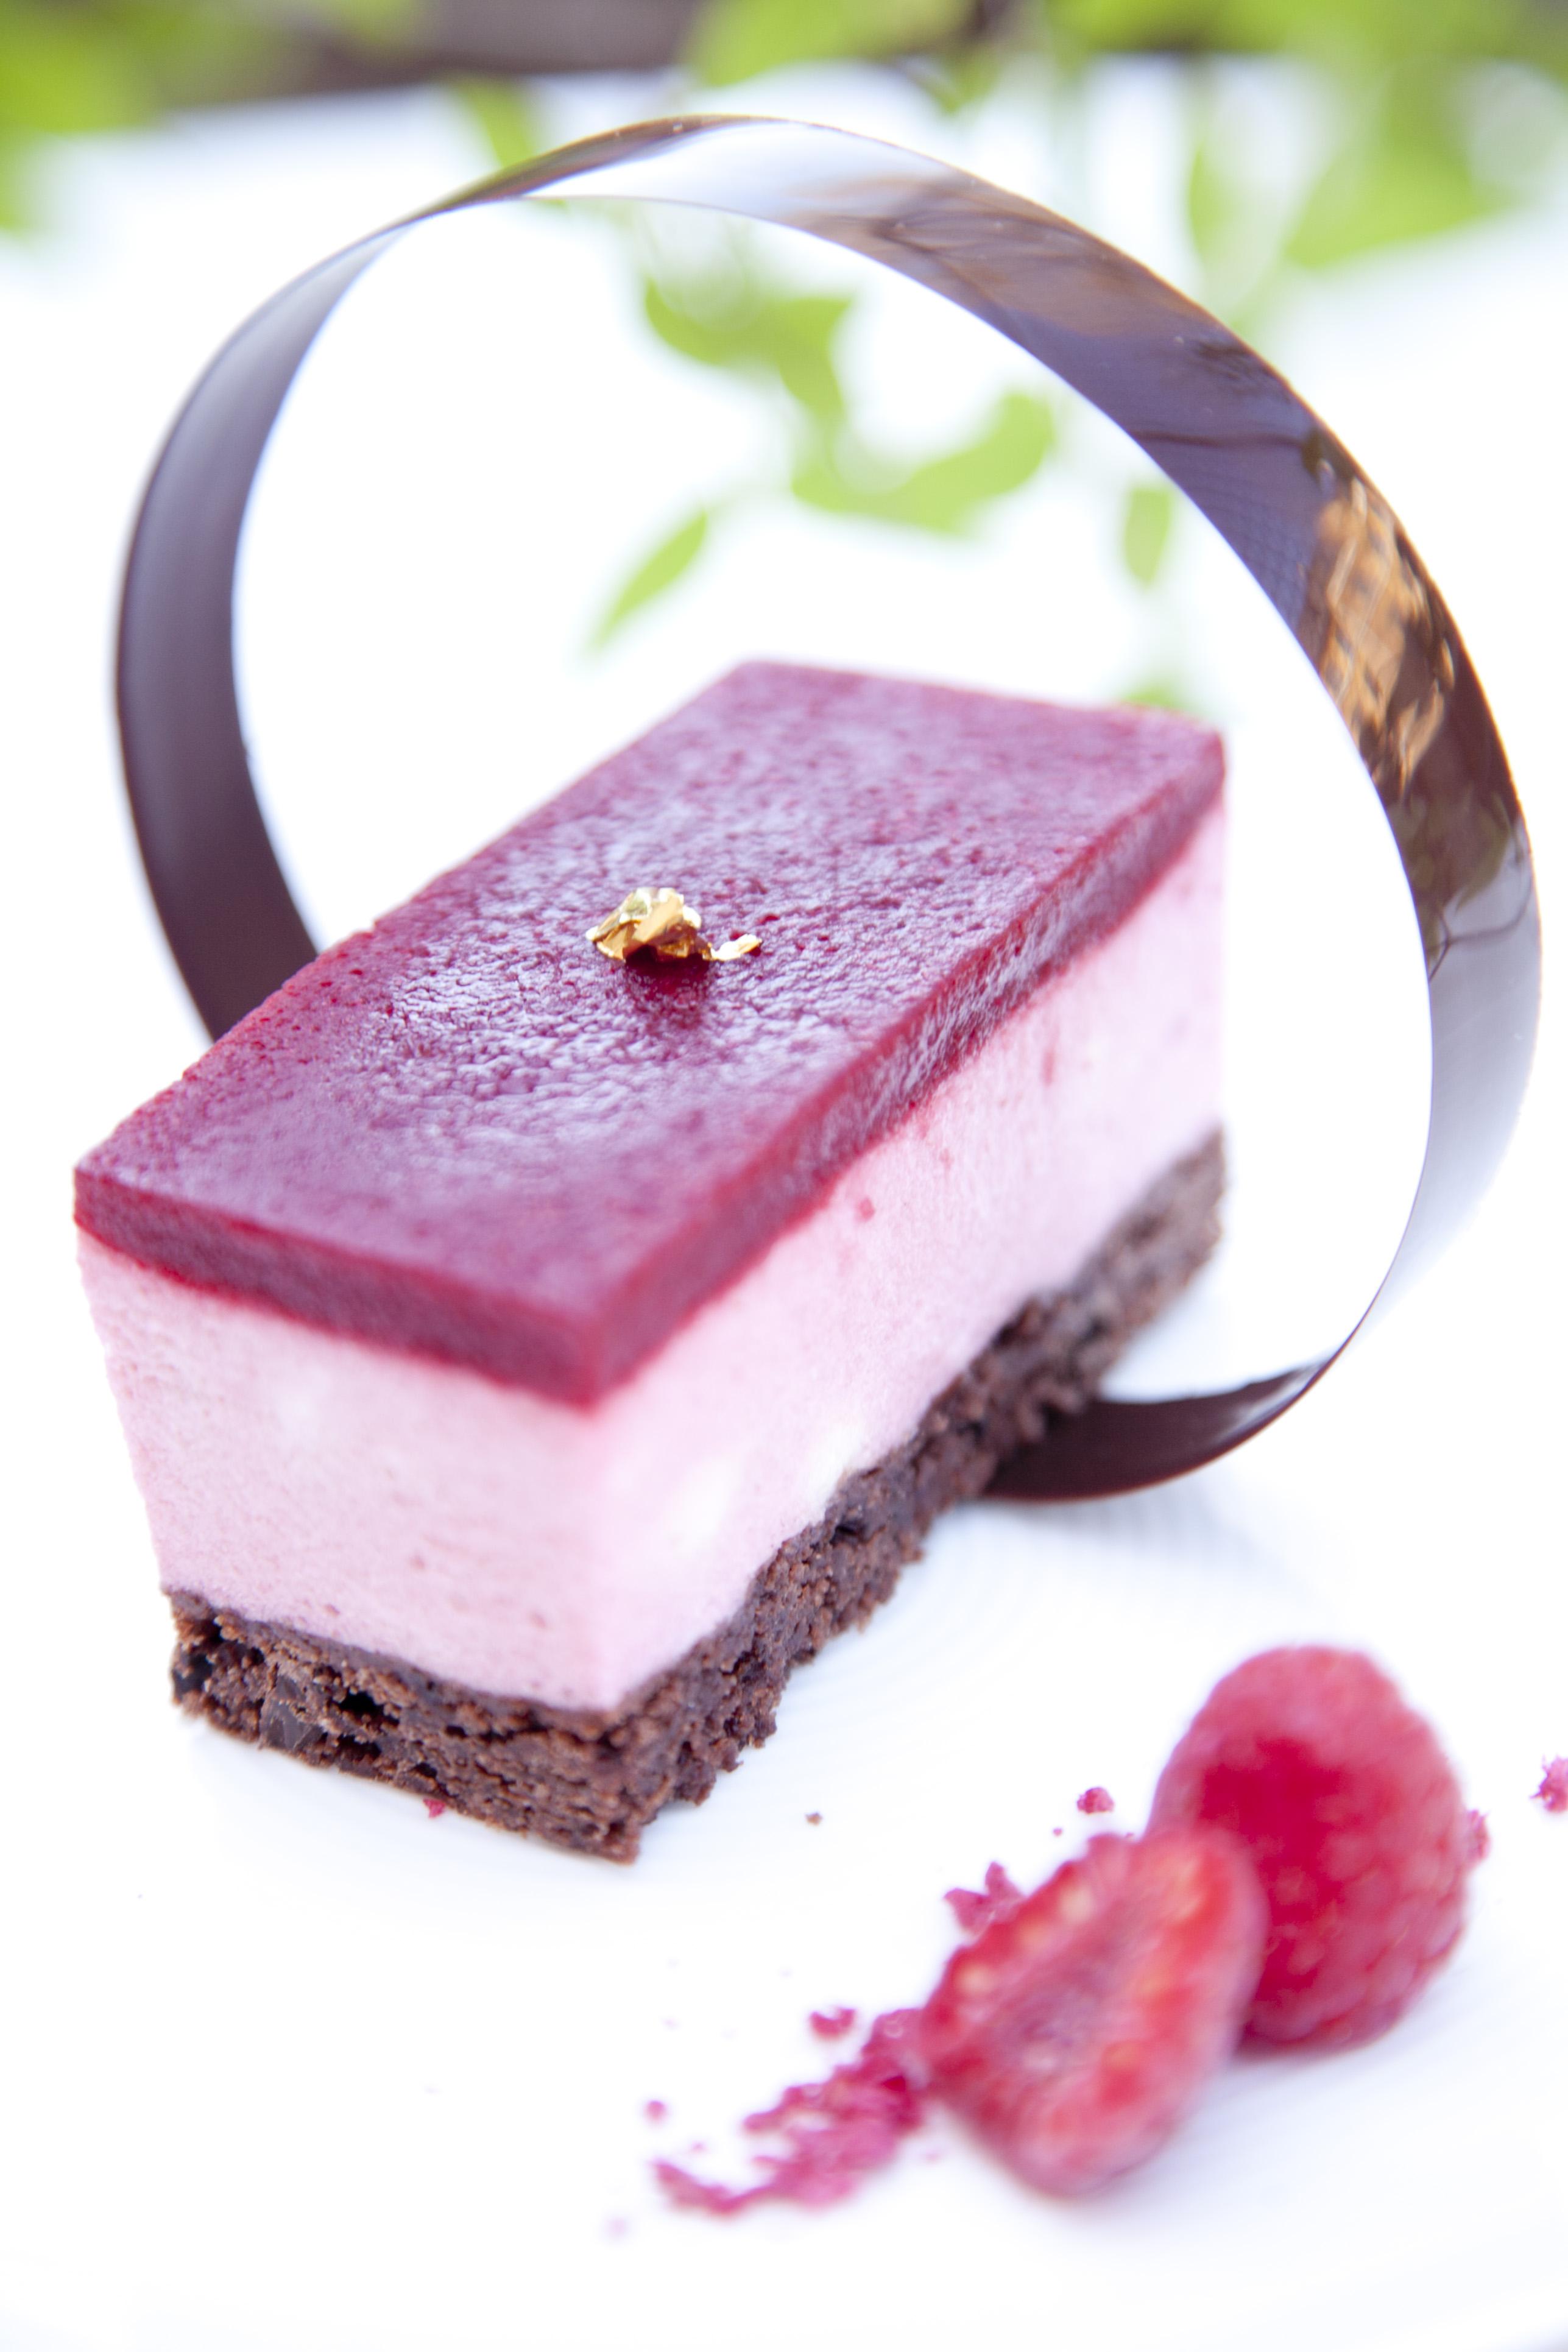 hallonmousse till tårta utan gelatin